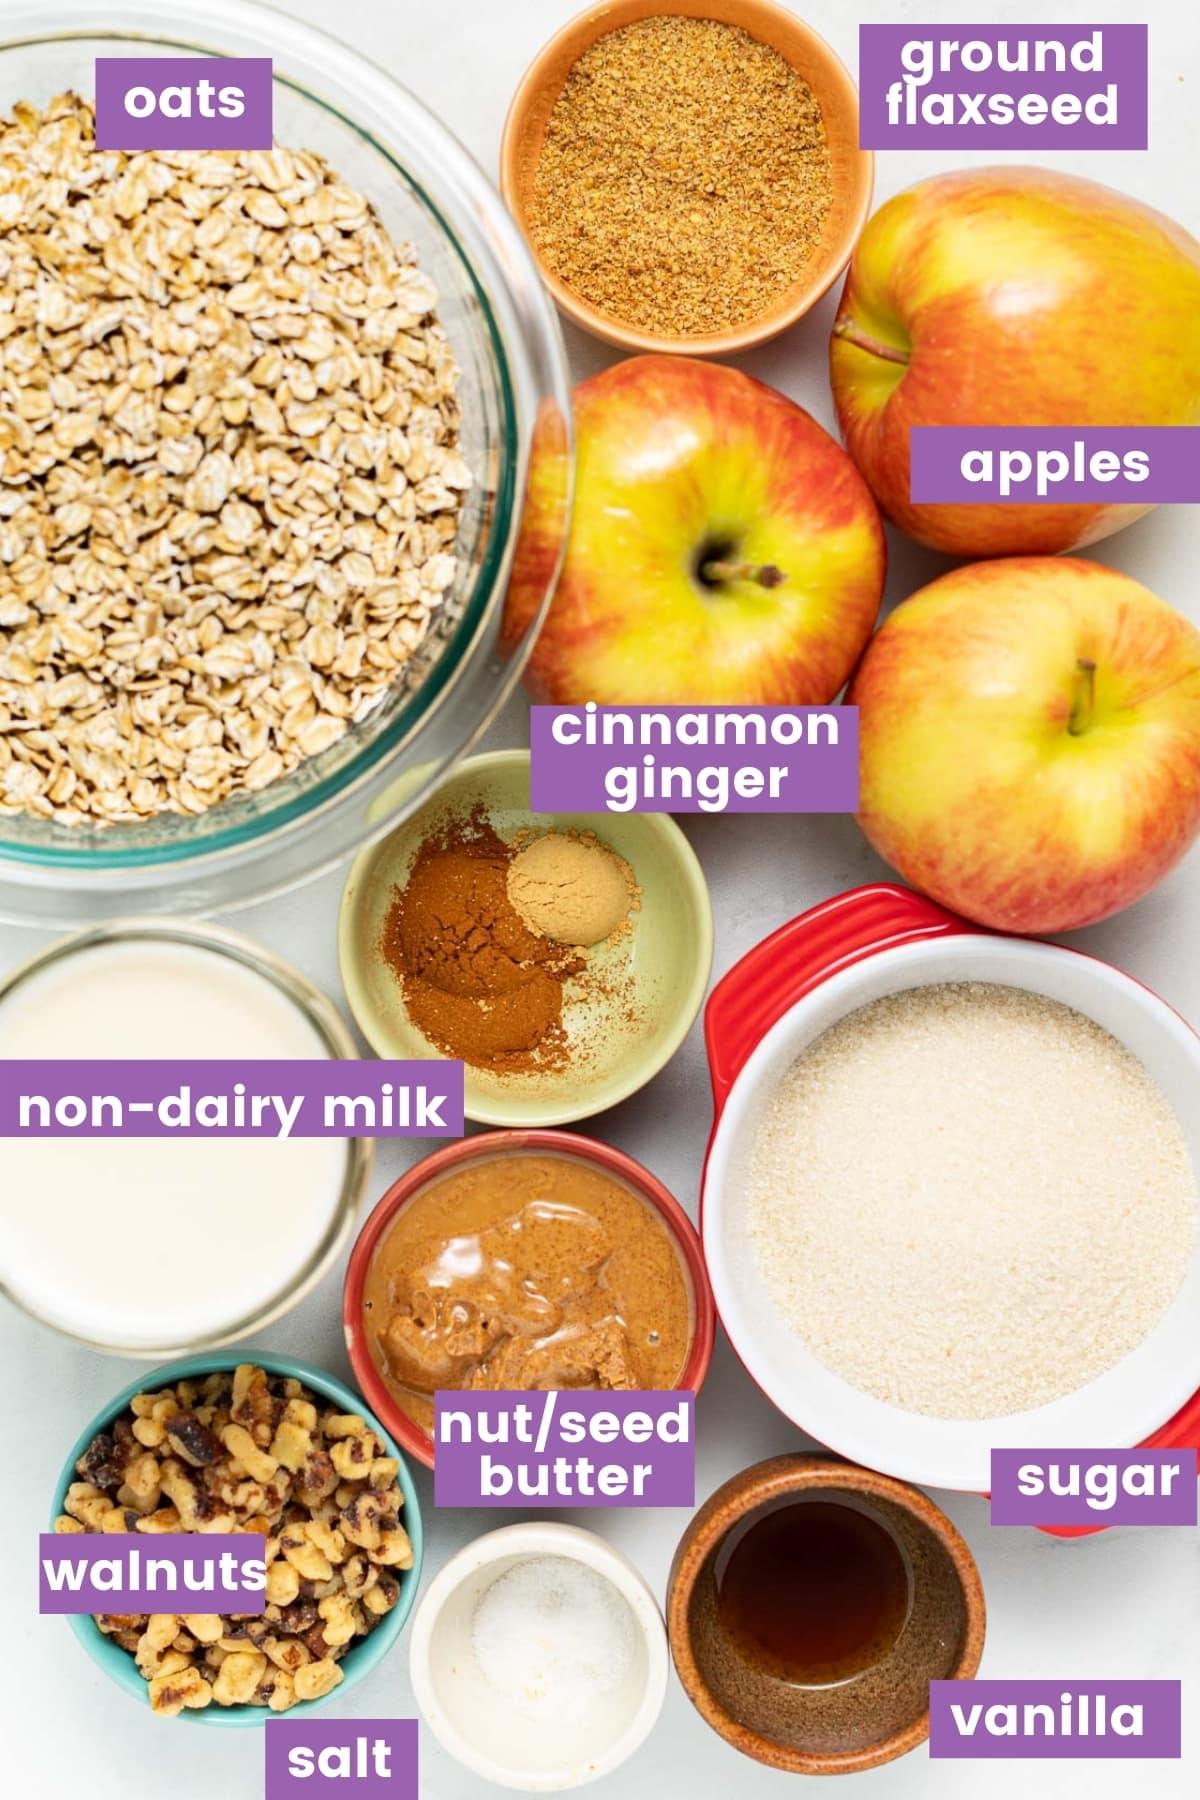 ingredients as per the written ingredients list